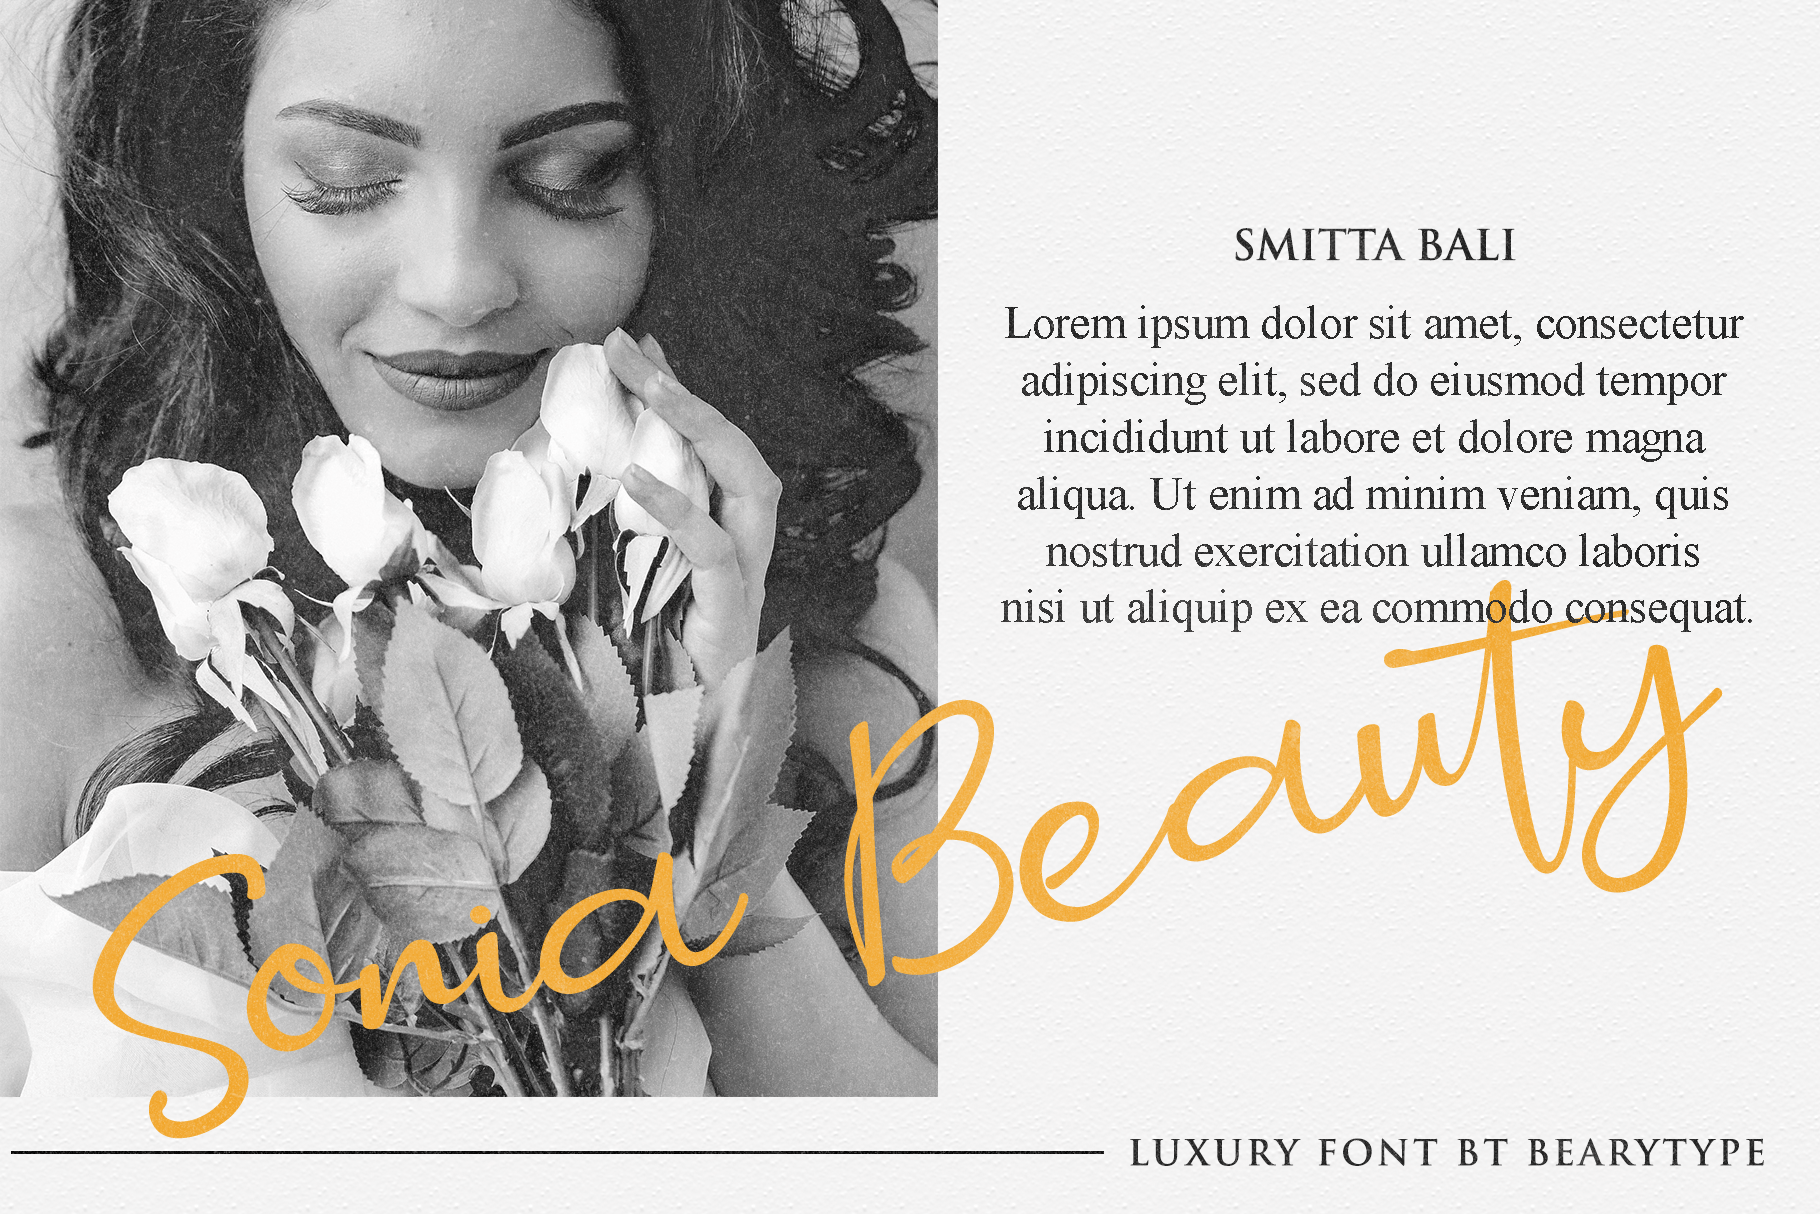 Smitta Bali - Luxury Signature Font example image 6